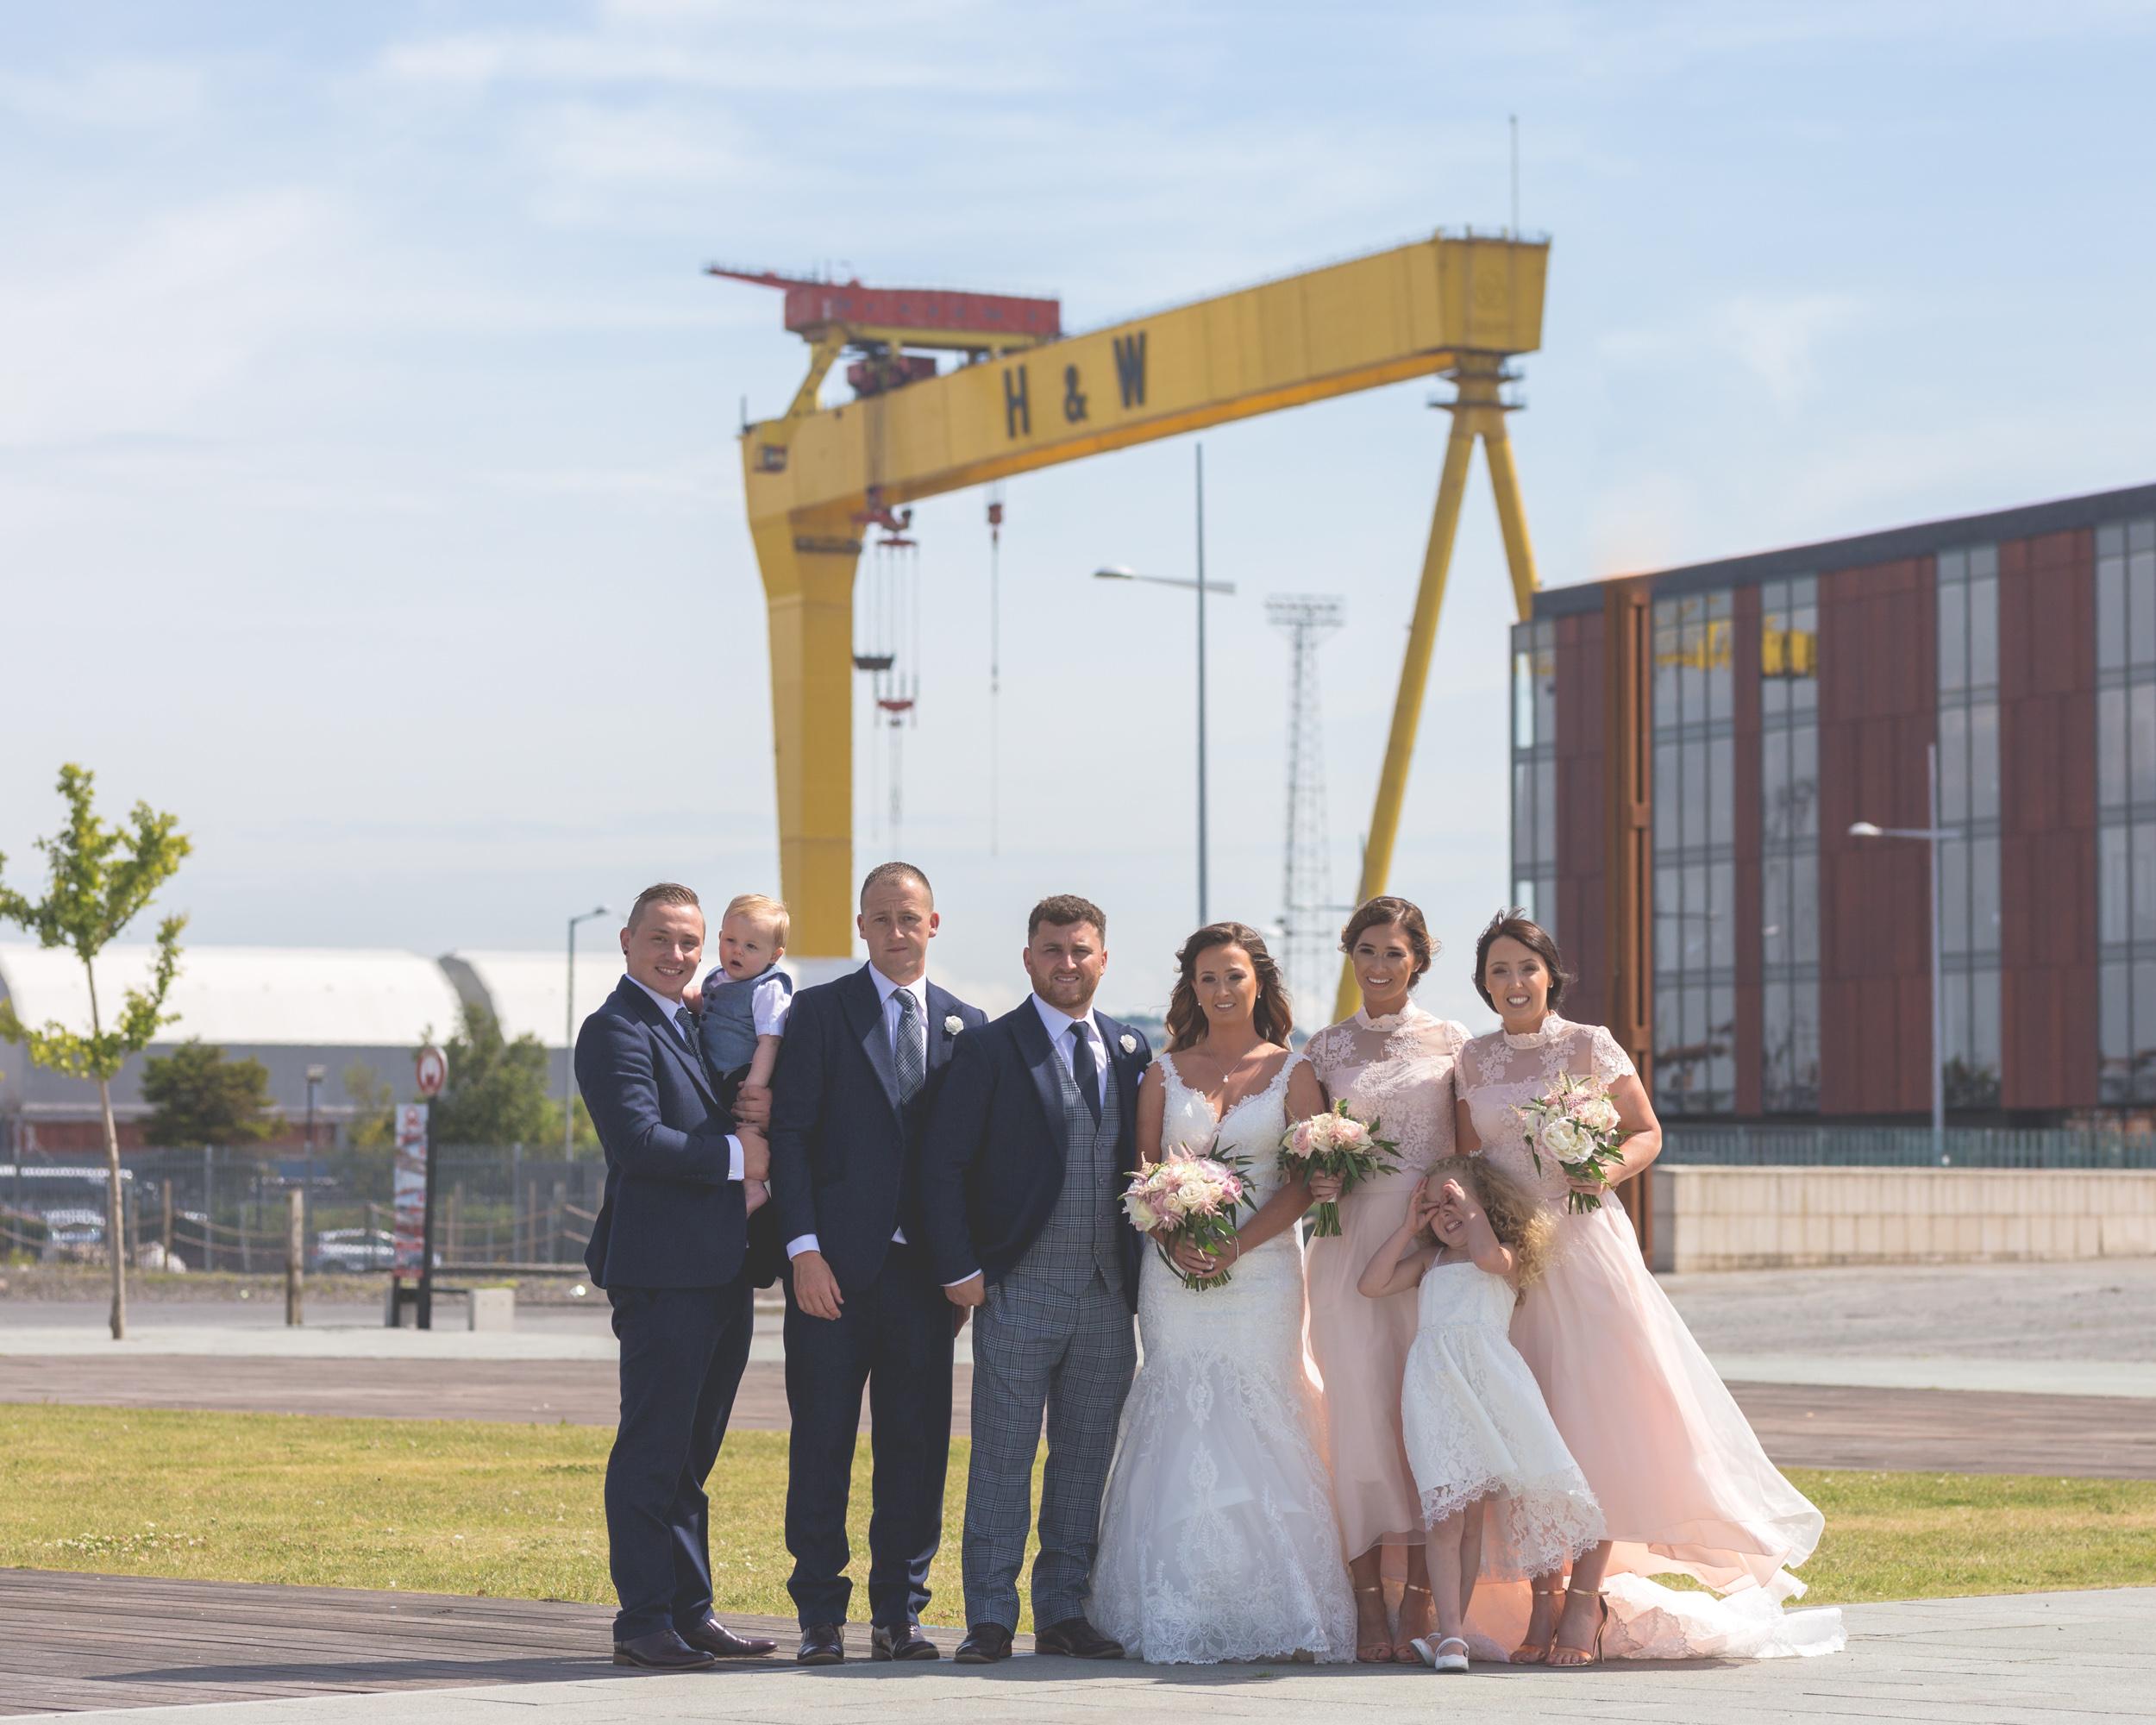 Brian McEwan   Northern Ireland Wedding Photographer   Rebecca & Michael   Portraits-48.jpg